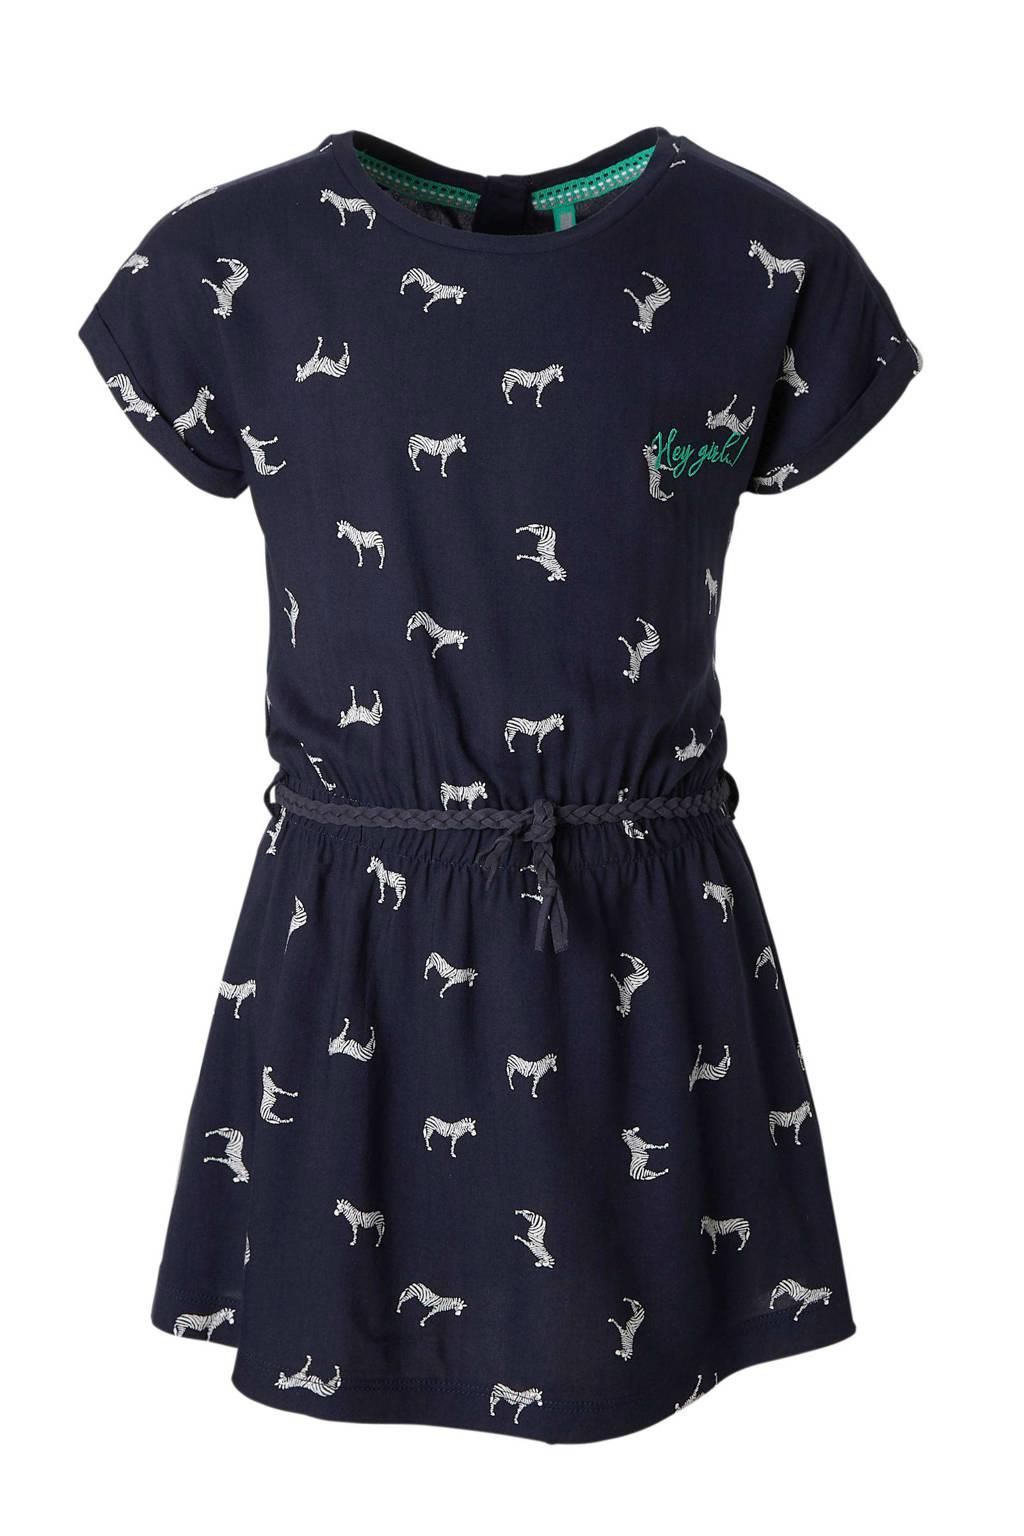 Quapi jurk Sharon met alloverprint donkerblauw, Donkerblauw